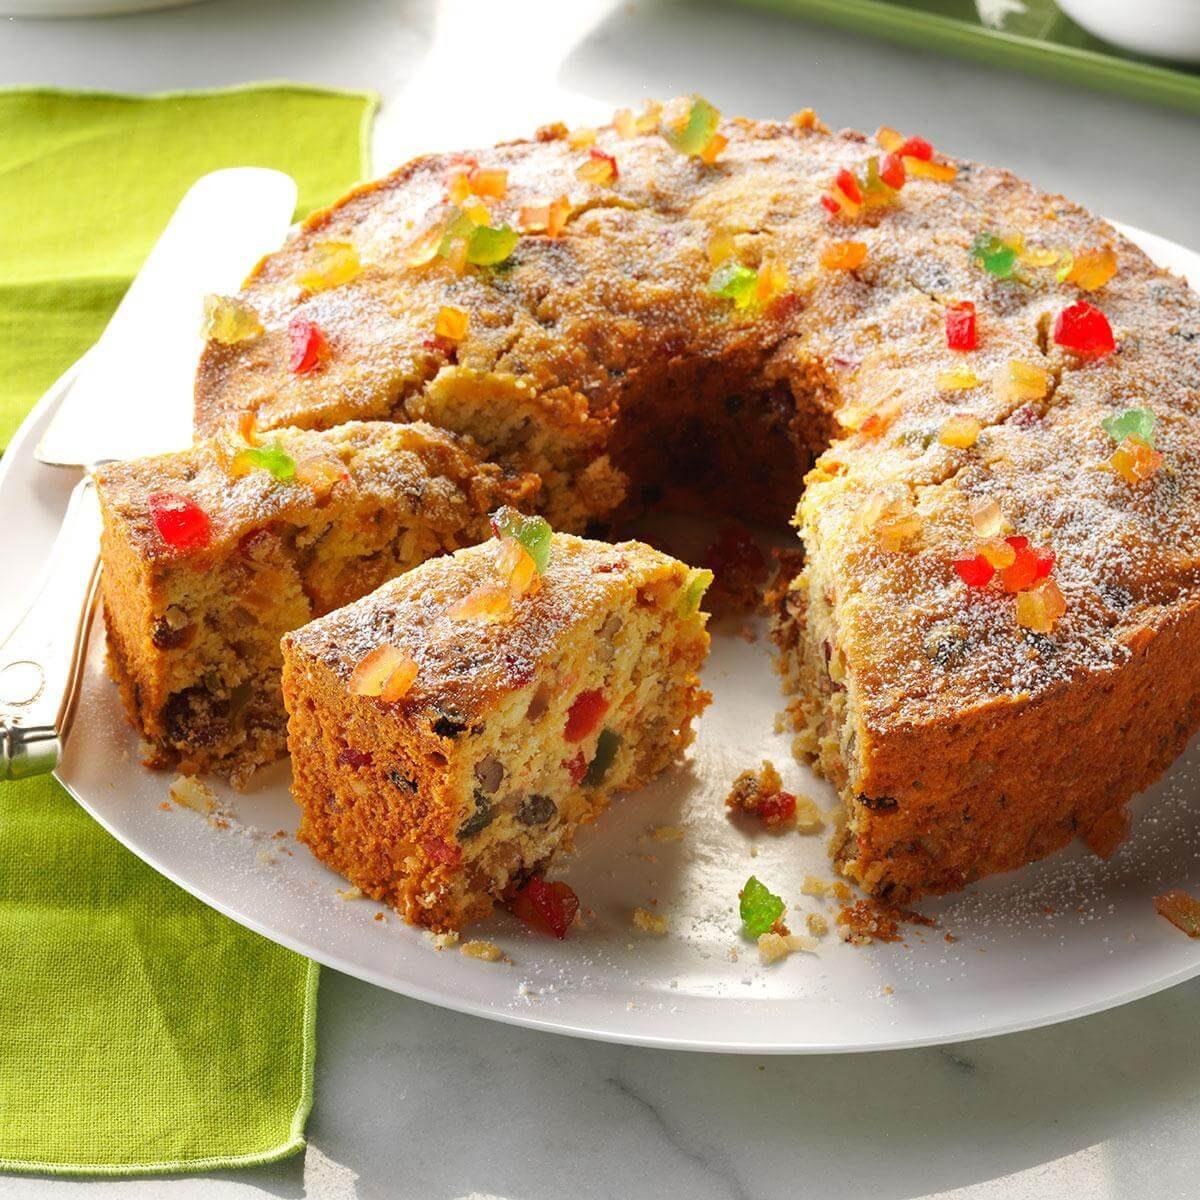 Cakes With Fruit Recipes: Coconut Fruitcake Recipe